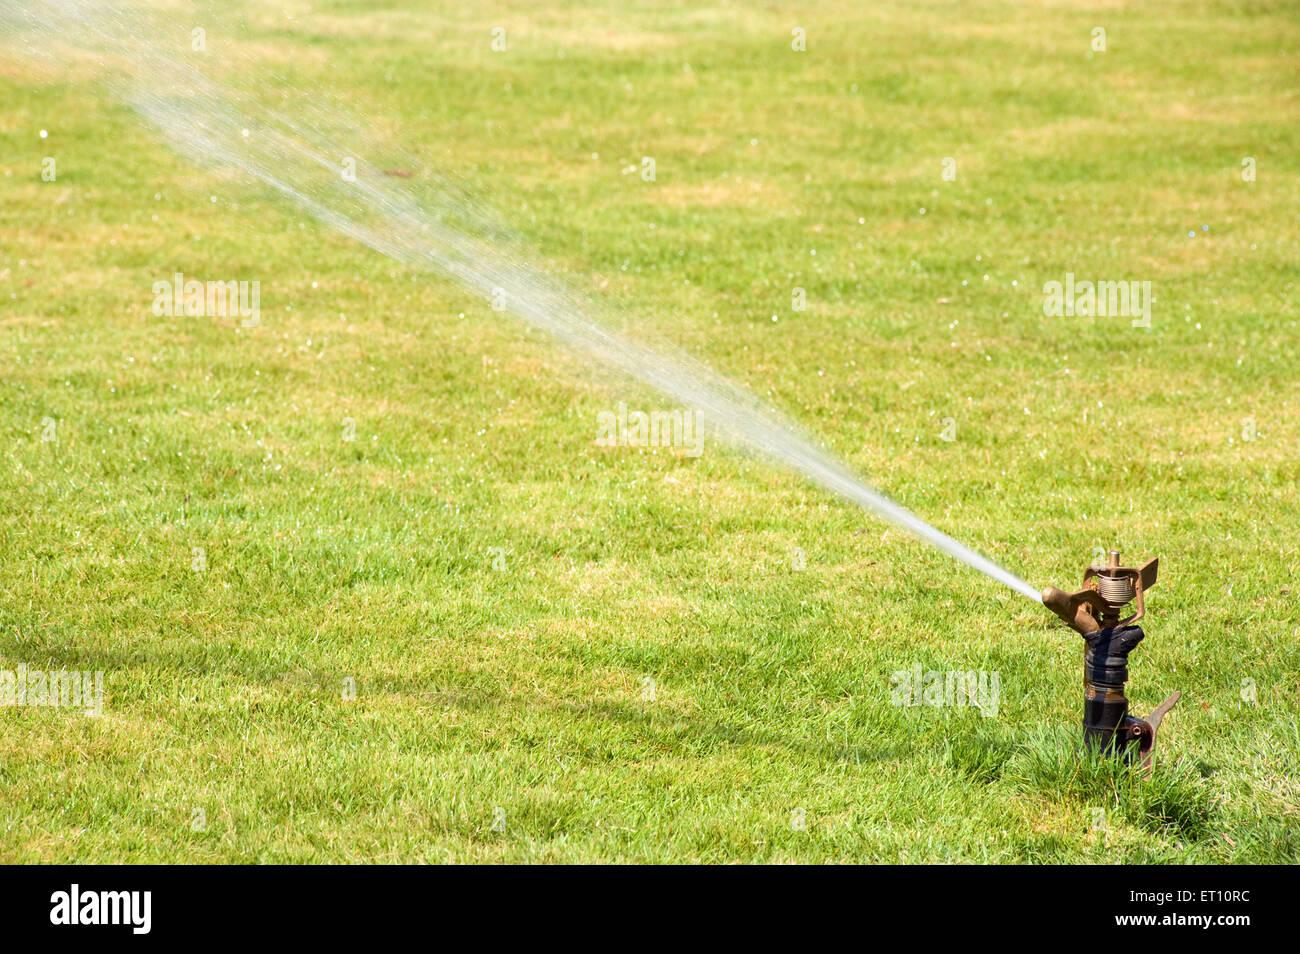 Water sprinkler at garcia de orta now municipal garden ; Panjim ; Goa ; India - Stock Image